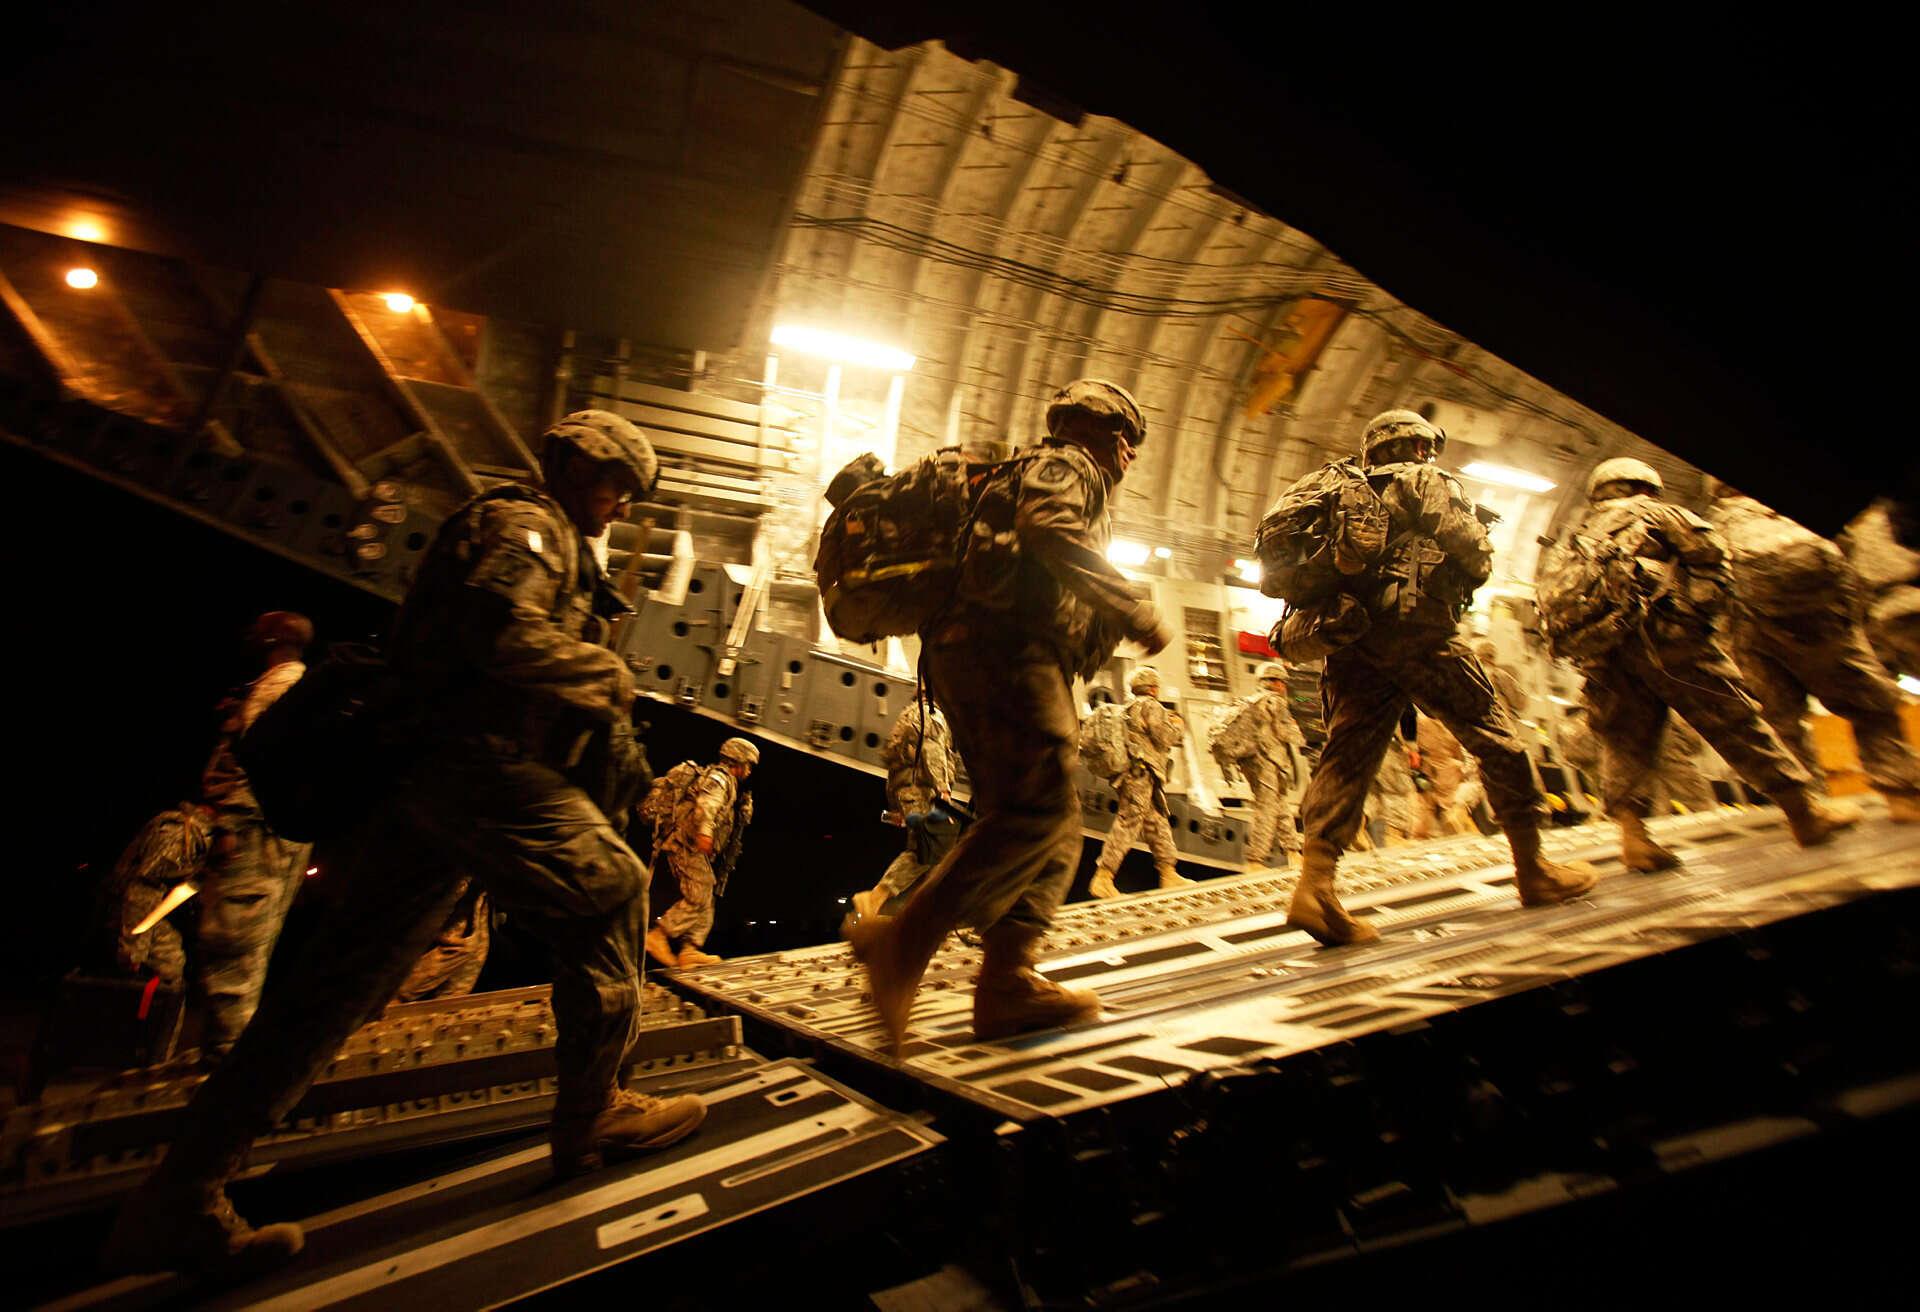 https://www.israelhayom.com/wp-content/uploads/2019/05/Iraq_Moving_Out_AMMA501.jpg